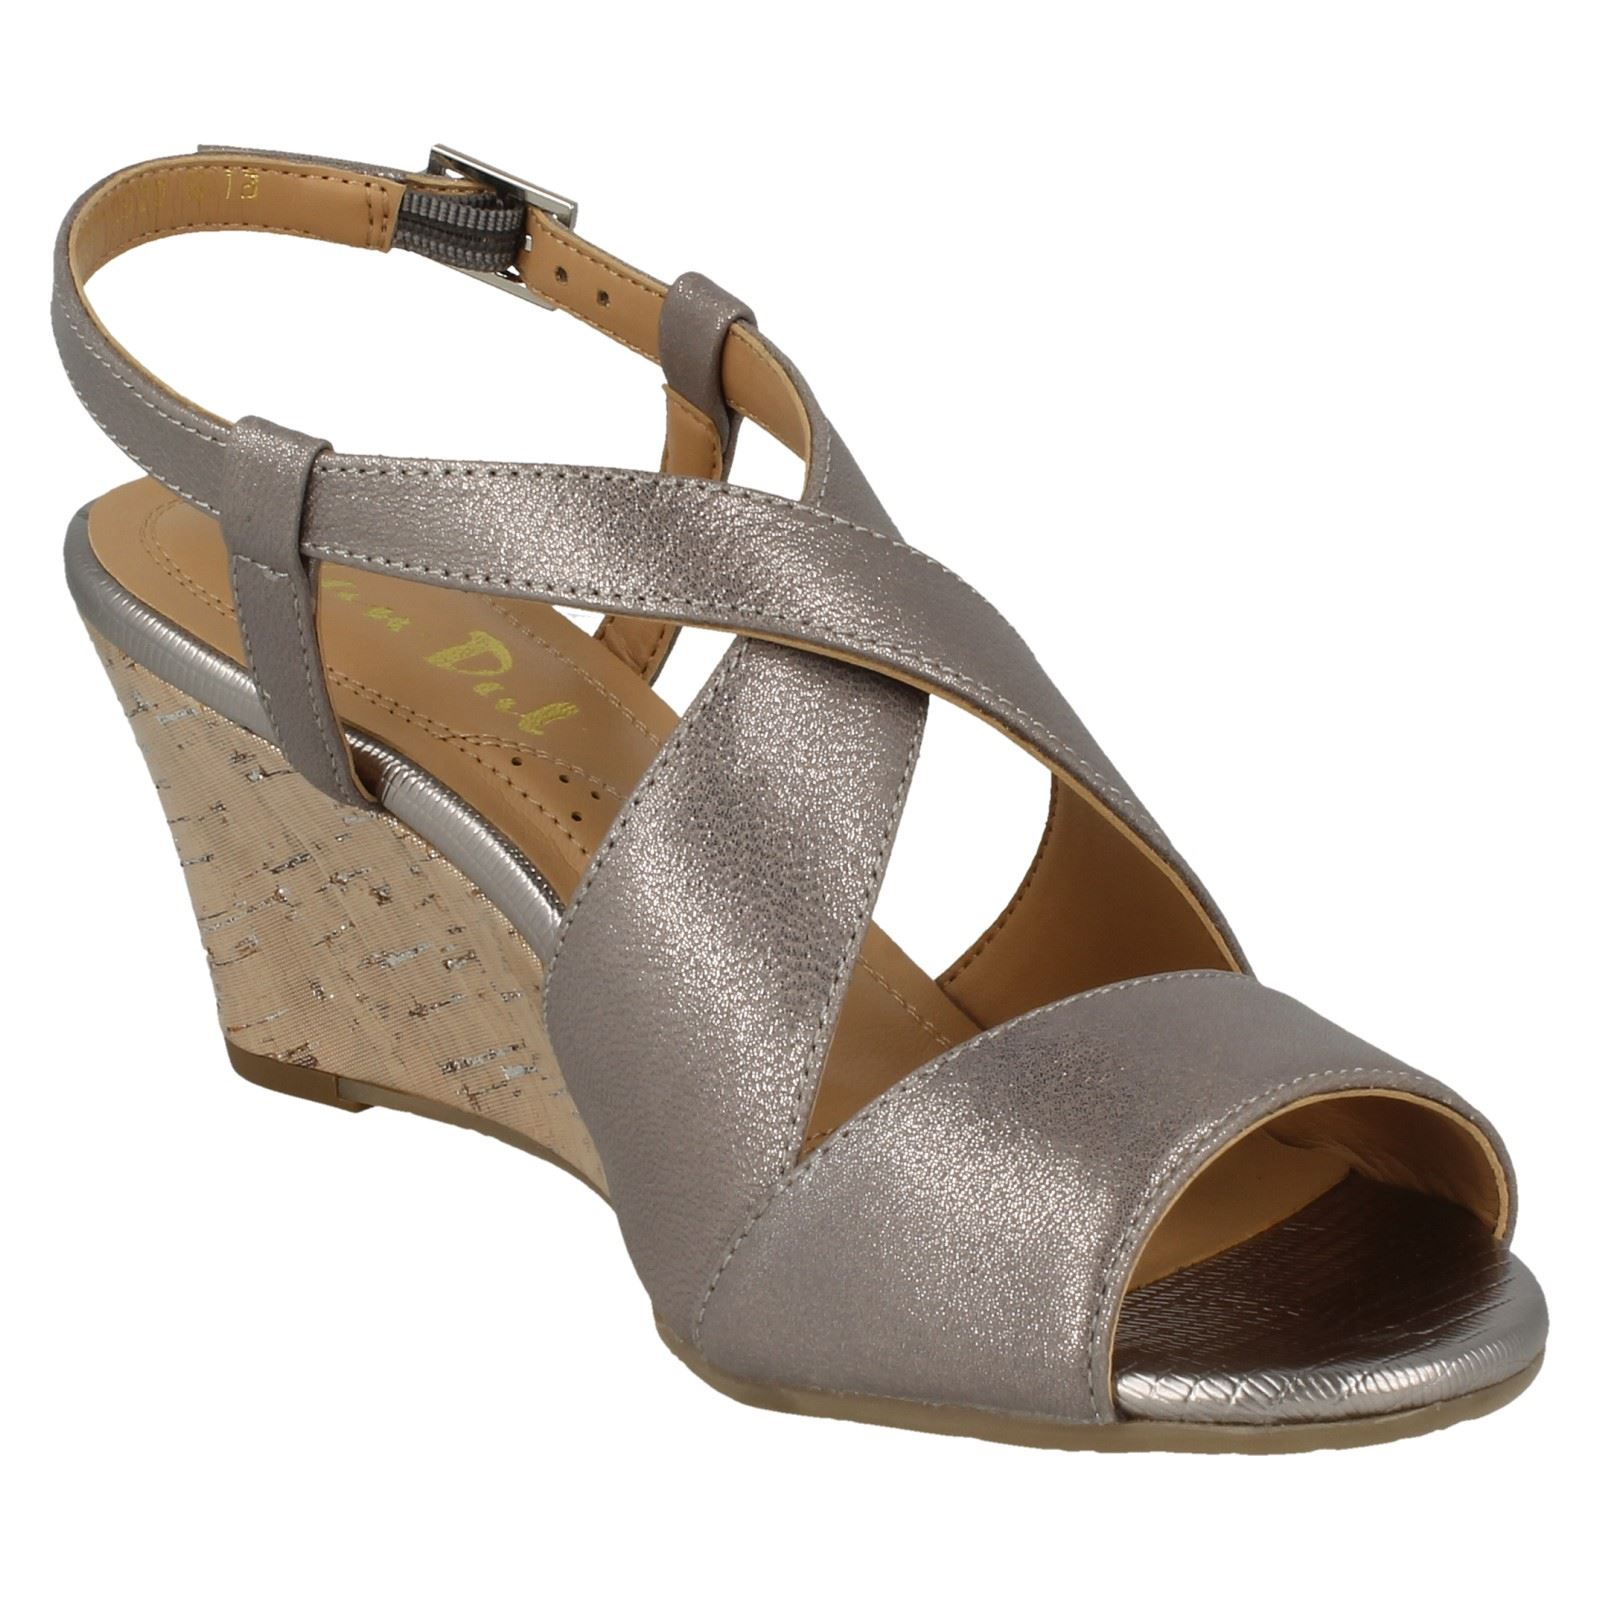 Ladies-Van-Dal-Cross-Strap-Wedged-Sandal-Allora thumbnail 27